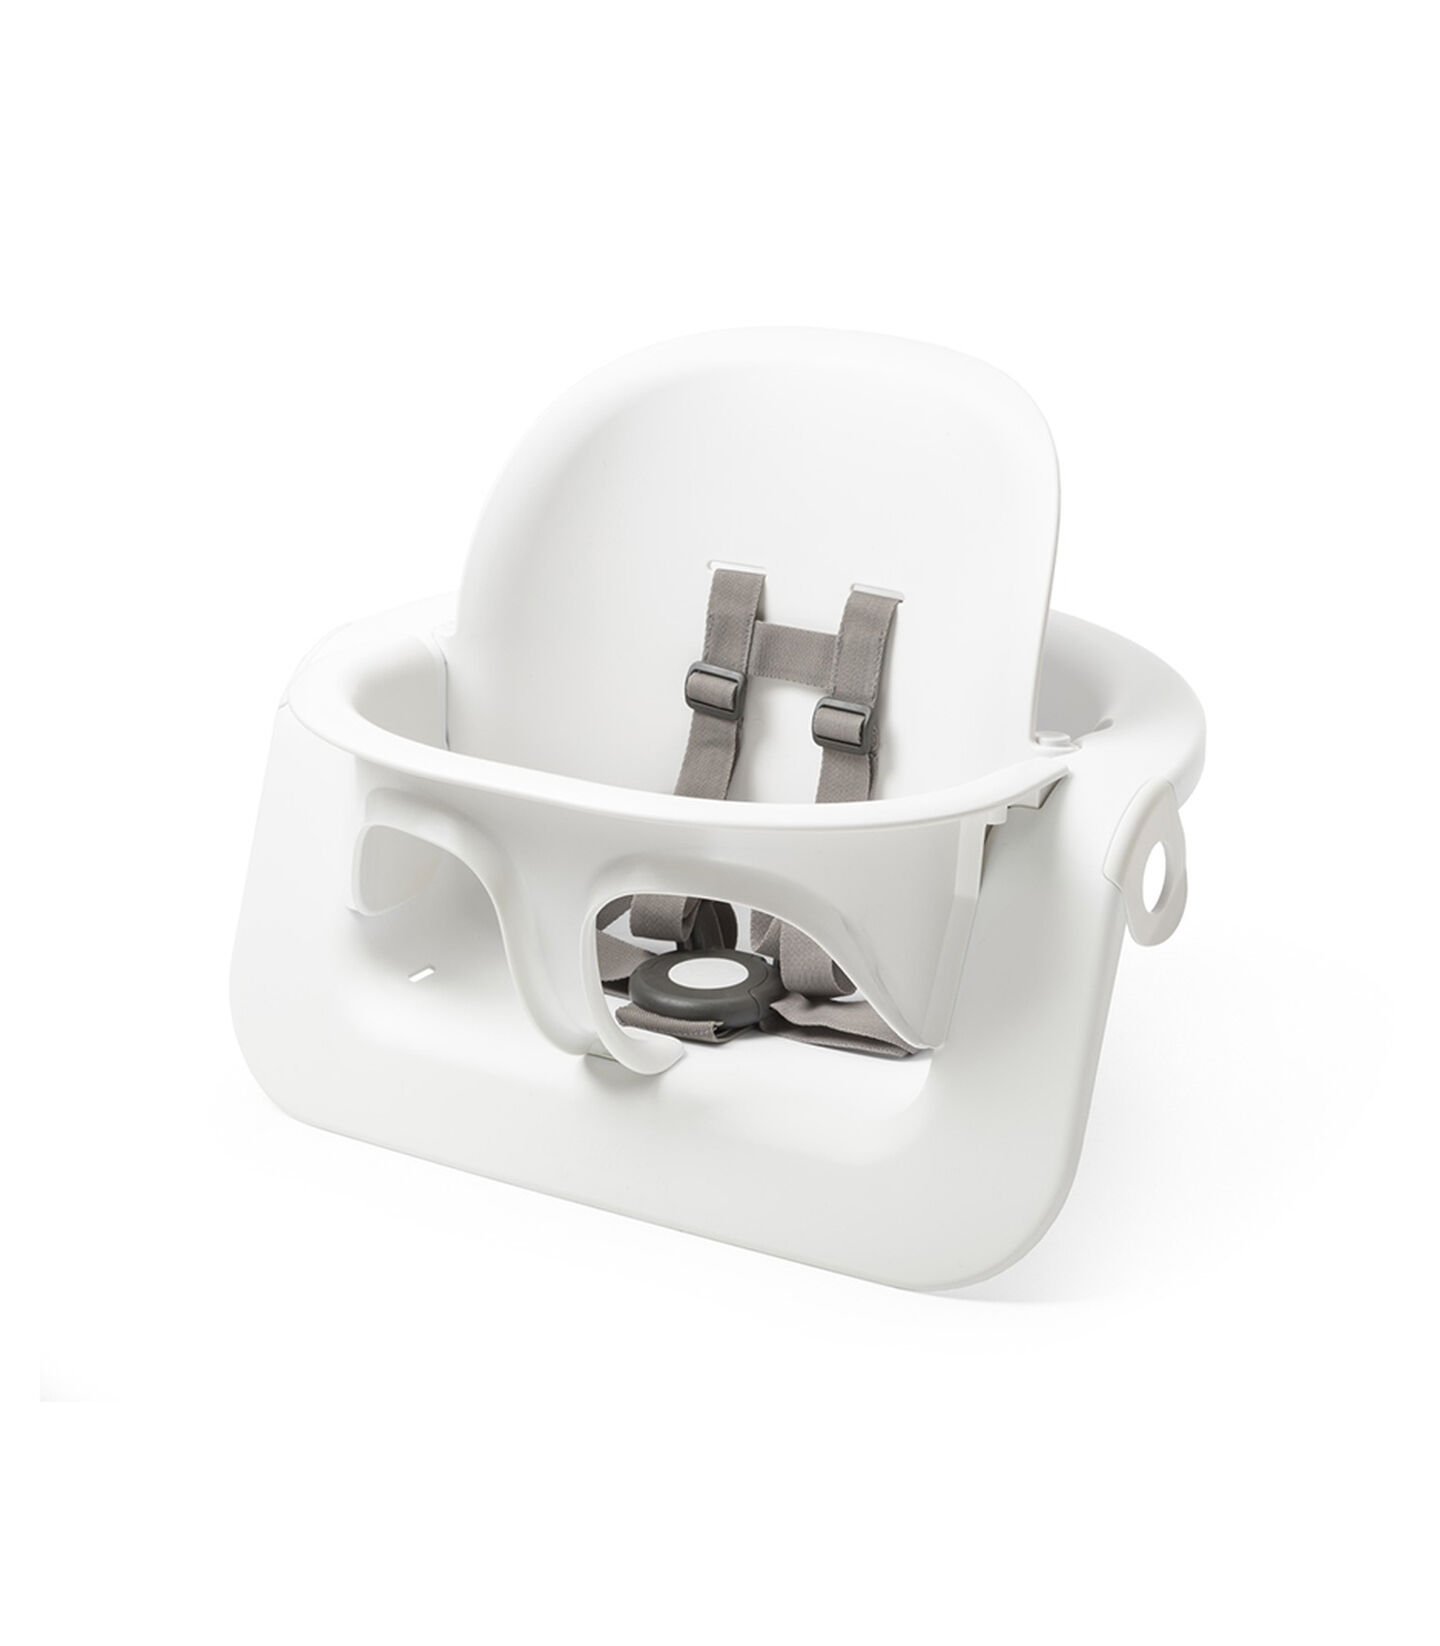 Stokke® Steps™ Baby Set White, White, mainview view 1